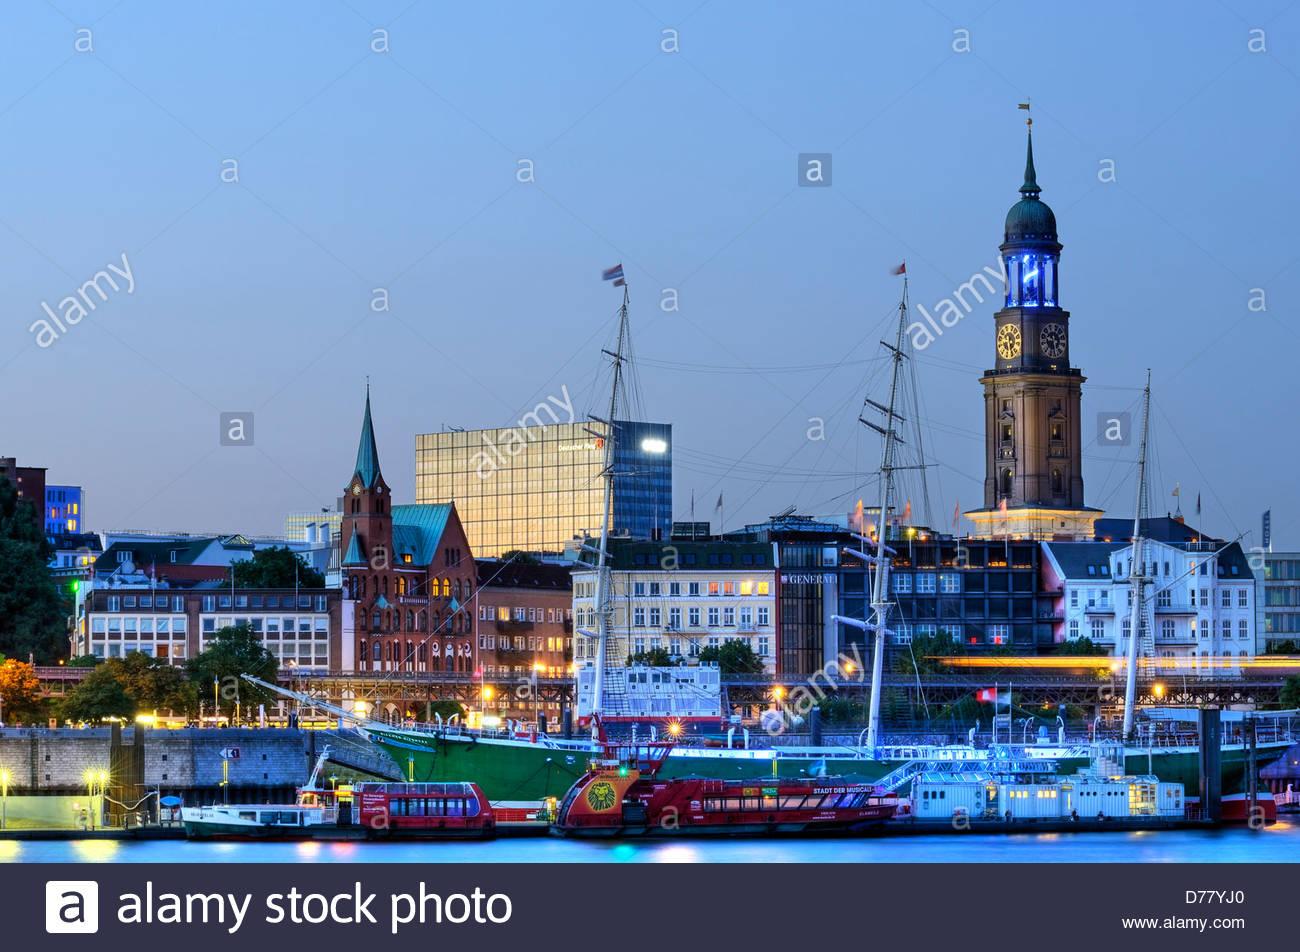 Illumination Blue port of Michael Batz, church Saint Michaelis and harbour shore in Hamburg, Germany, Europe - Stock Image